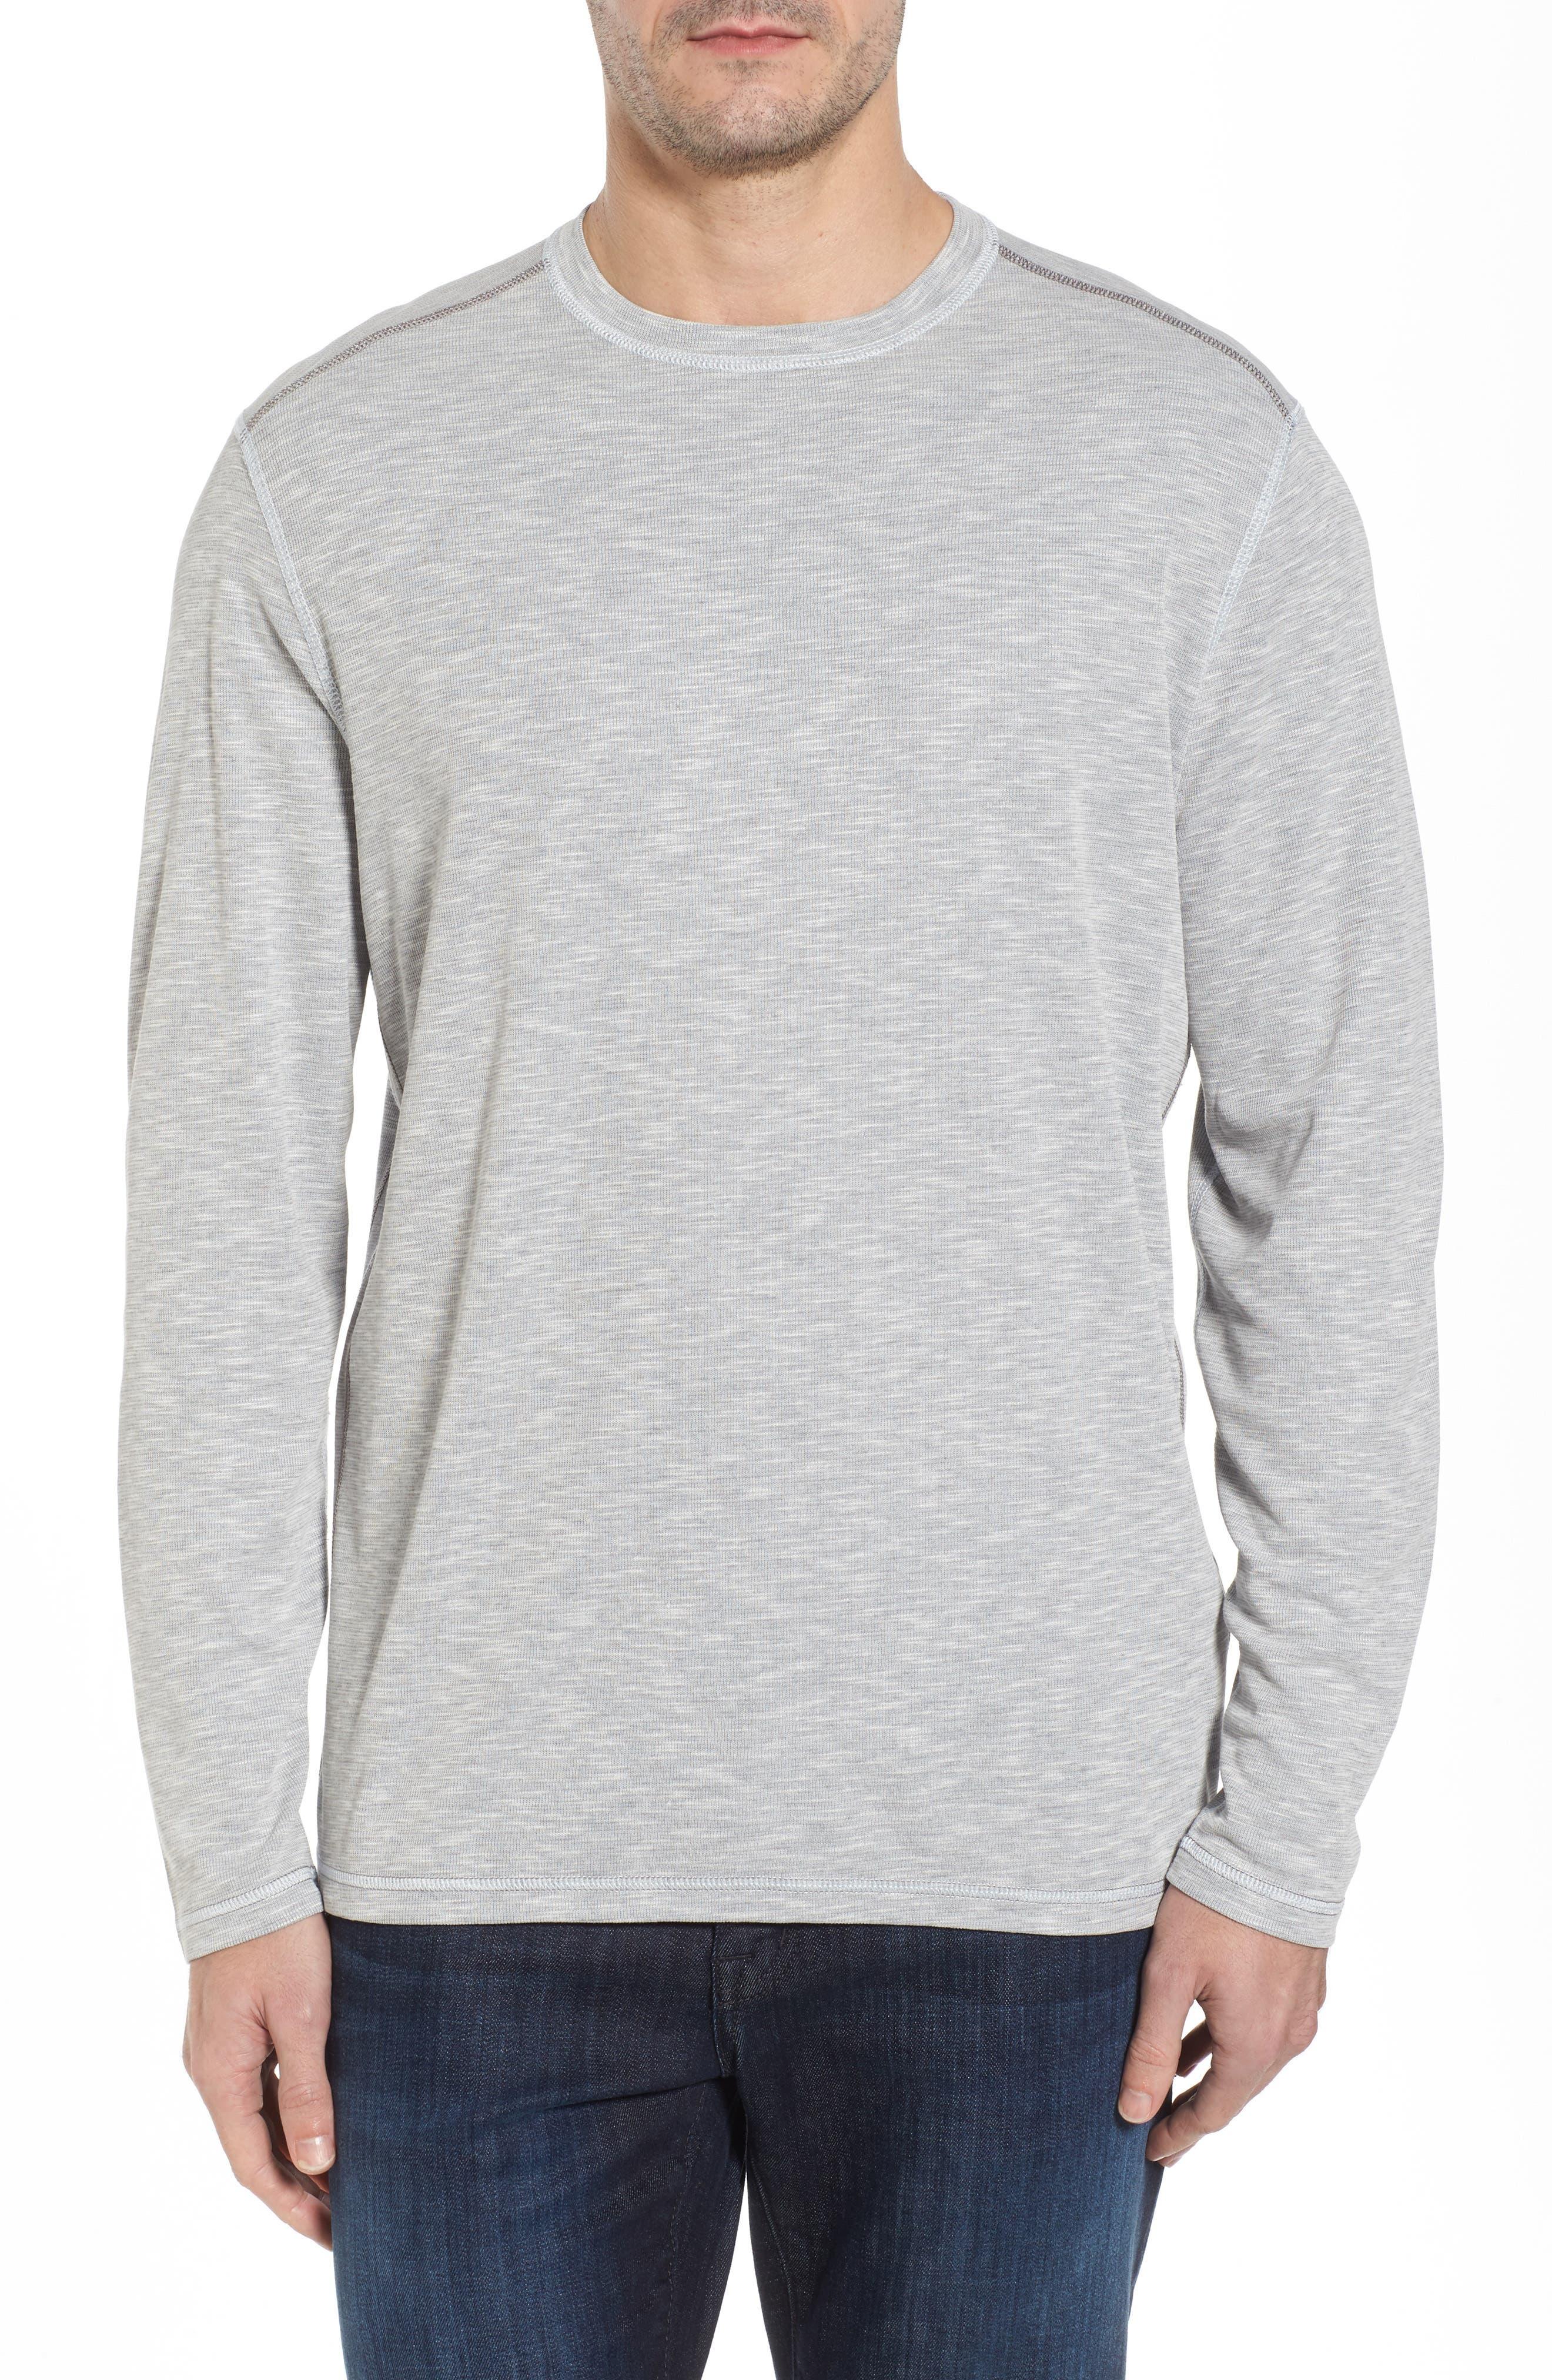 Alternate Image 1 Selected - Tommy Bahama Flip Tide Long Sleeve T-Shirt